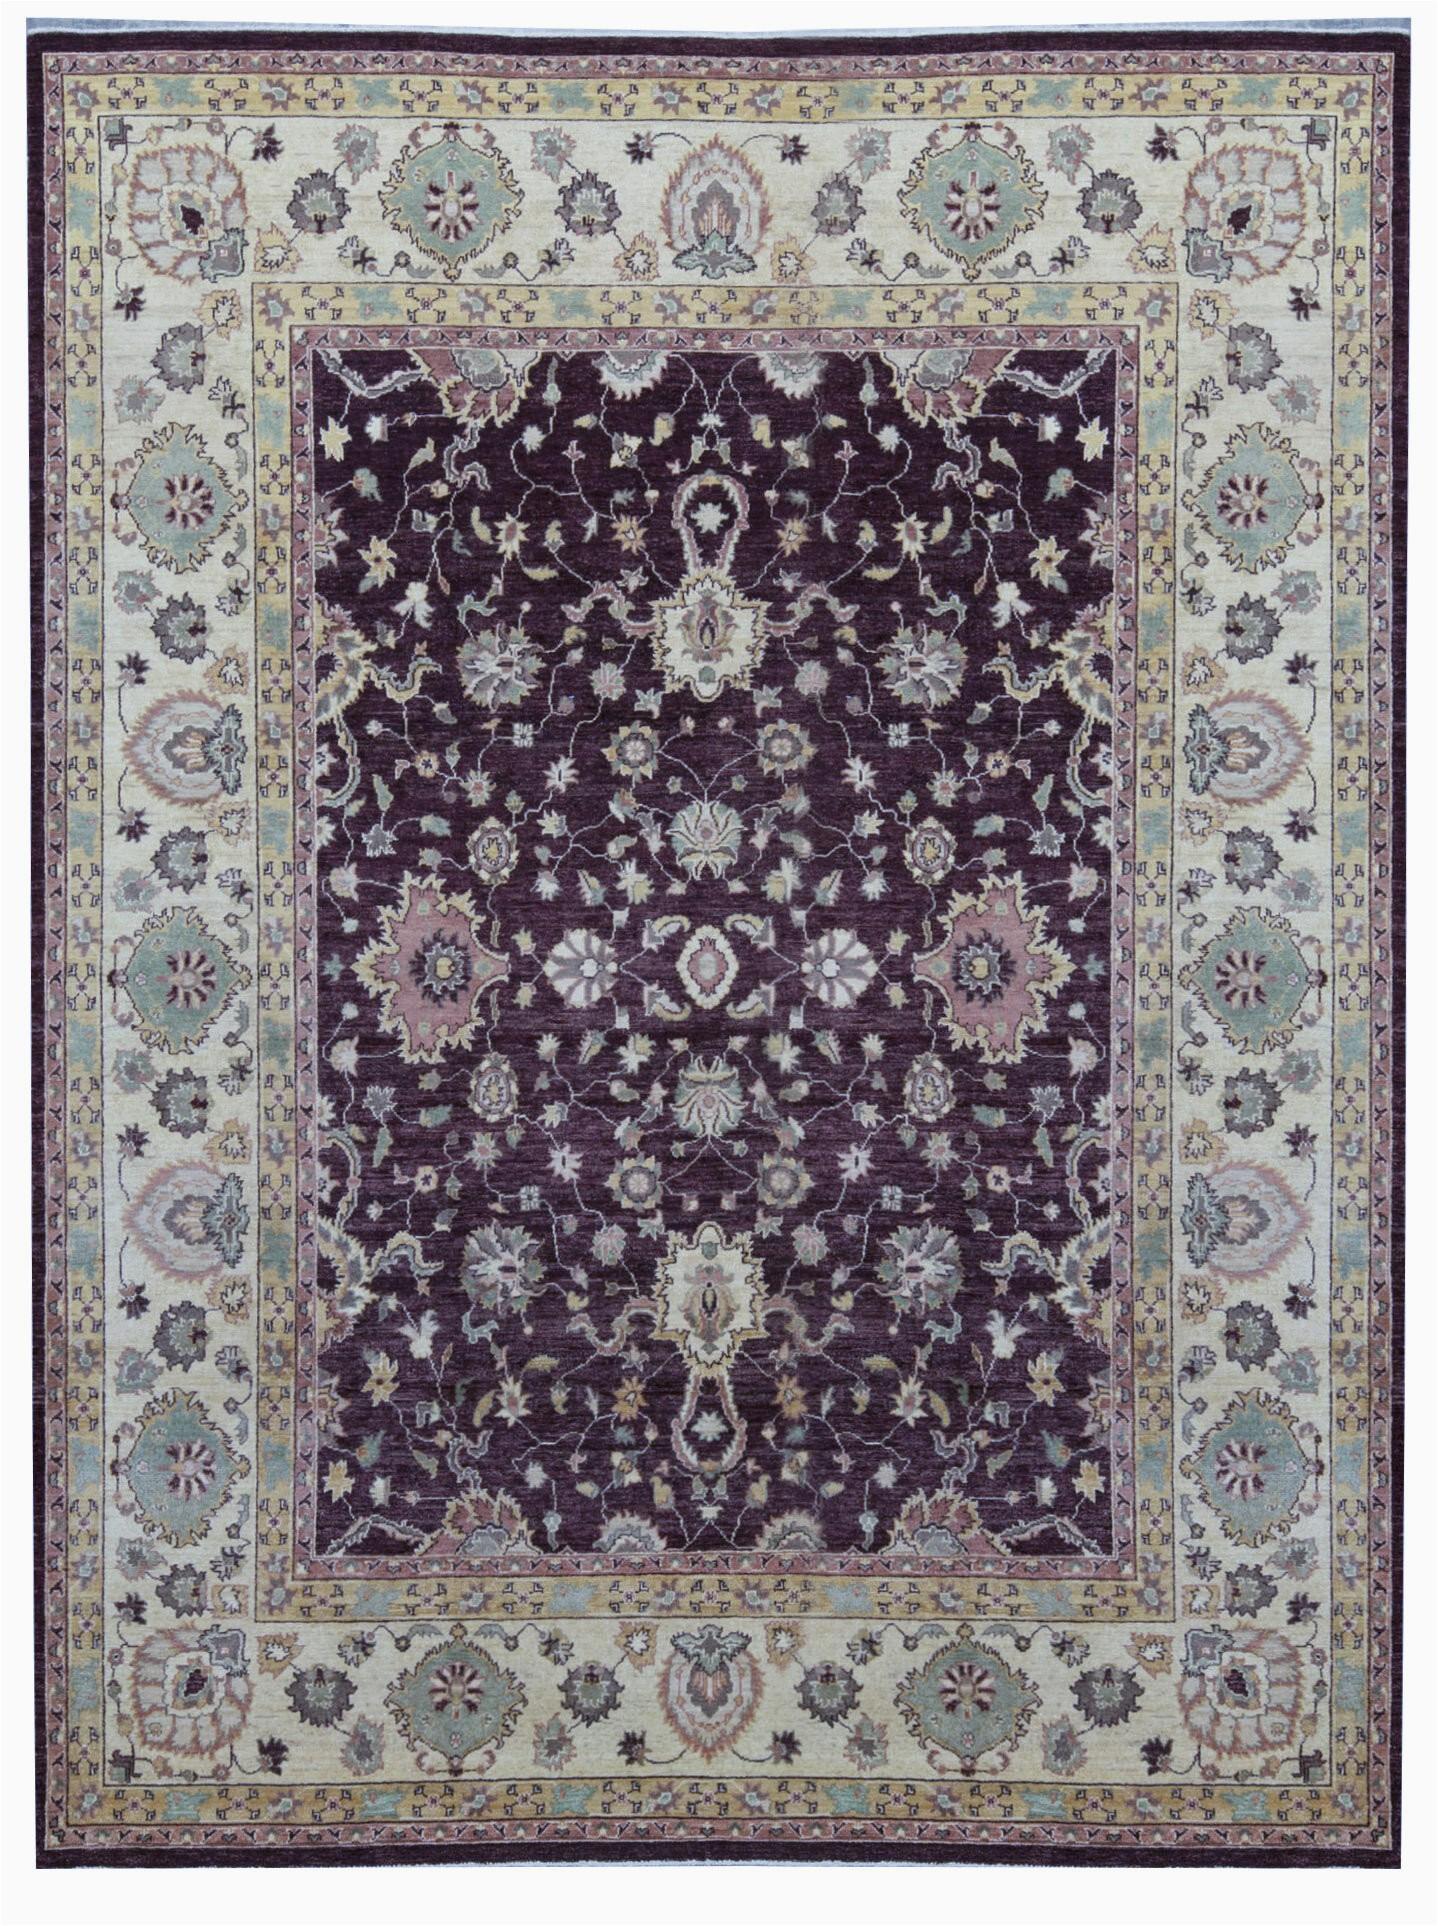 bokara rug co inc one of a kind hand knotted browncream 9 x 1110 wool area rug abhd4449